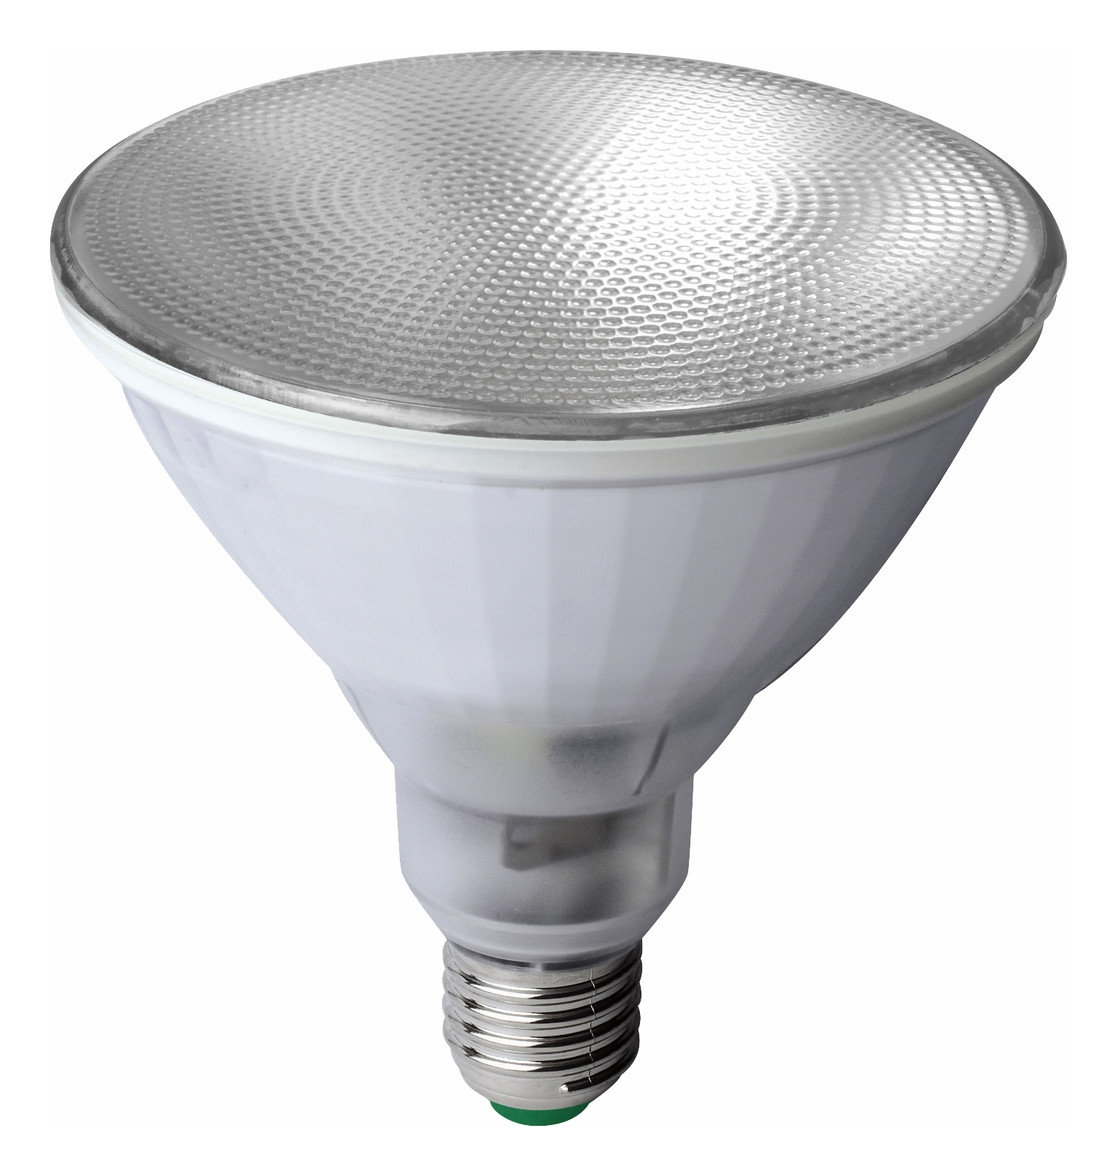 LED Lampen günstig online kaufen   vigedo.de